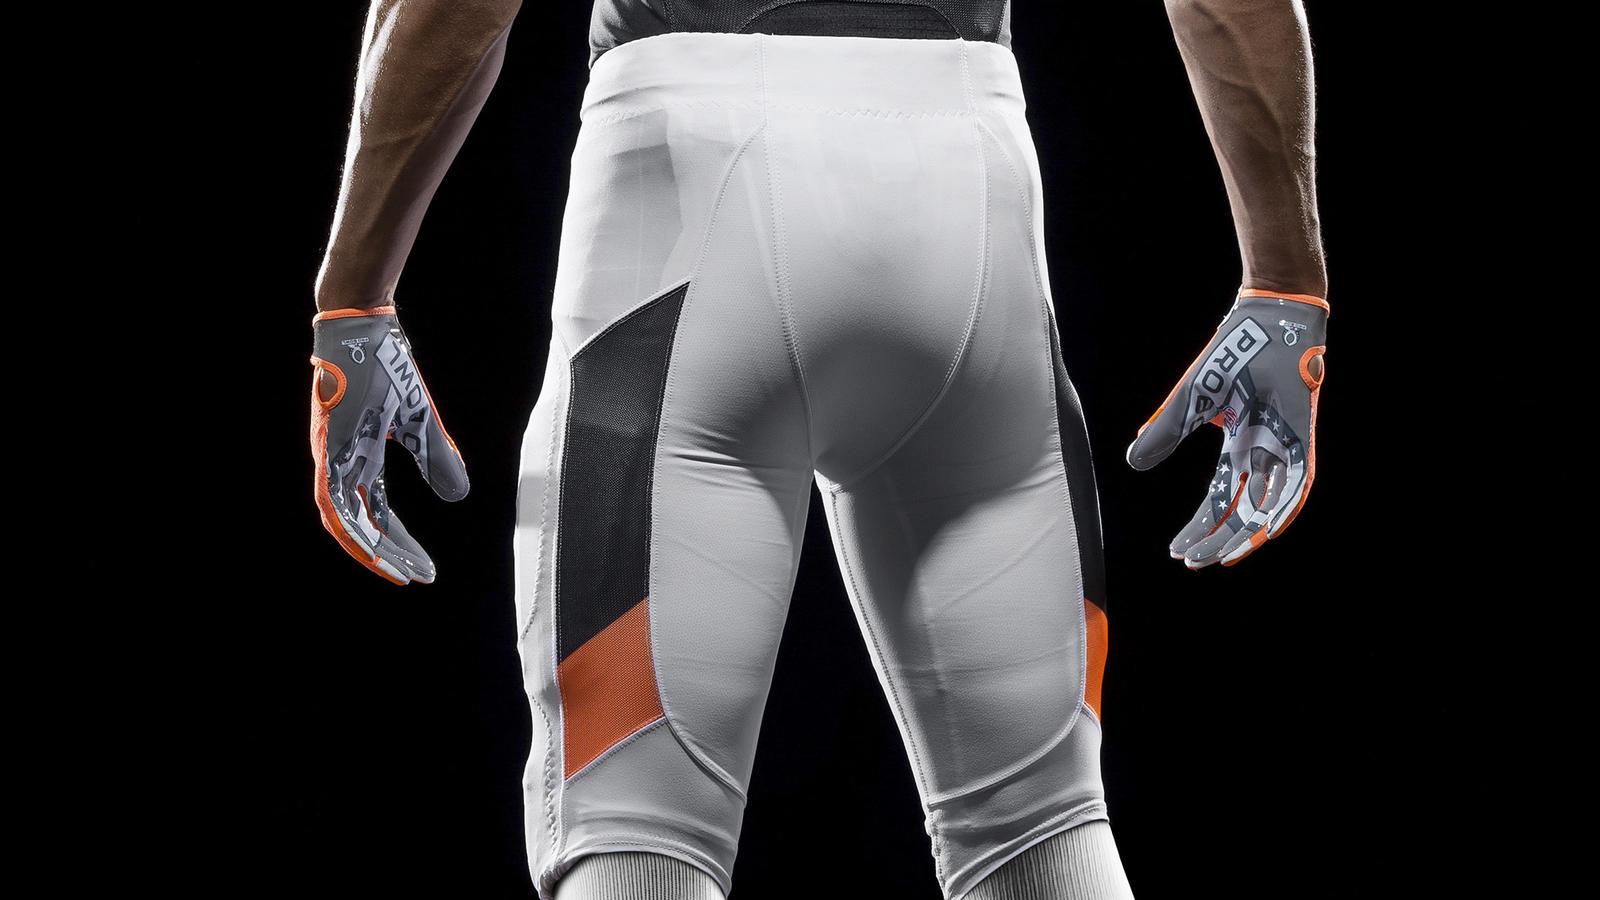 SP14_NFL_SB_TeamUni_NFC_4699_PR_crop_3